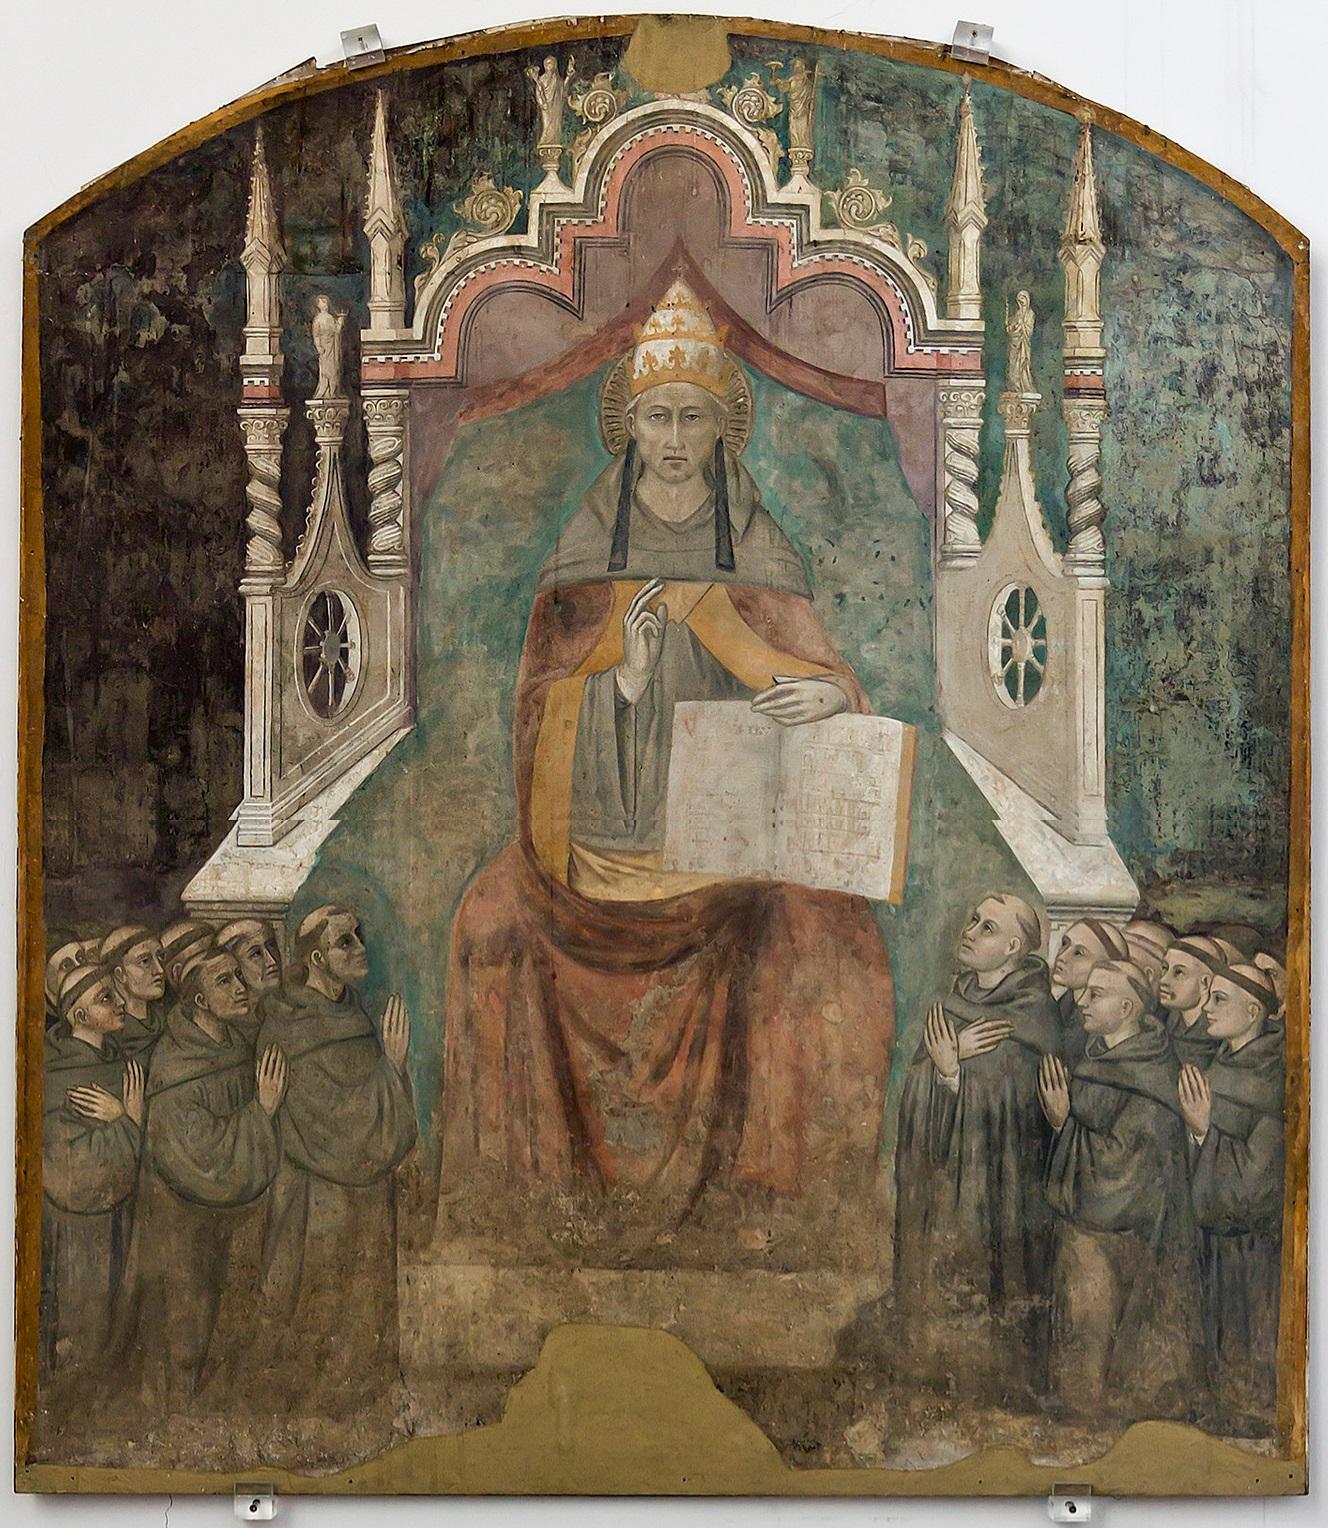 https://i1.wp.com/www.thehistoryblog.com/wp-content/uploads/2013/05/Pope-Saint-Celestine-V-in-Majesty-by-Niccolo-di-Tommaso.jpg